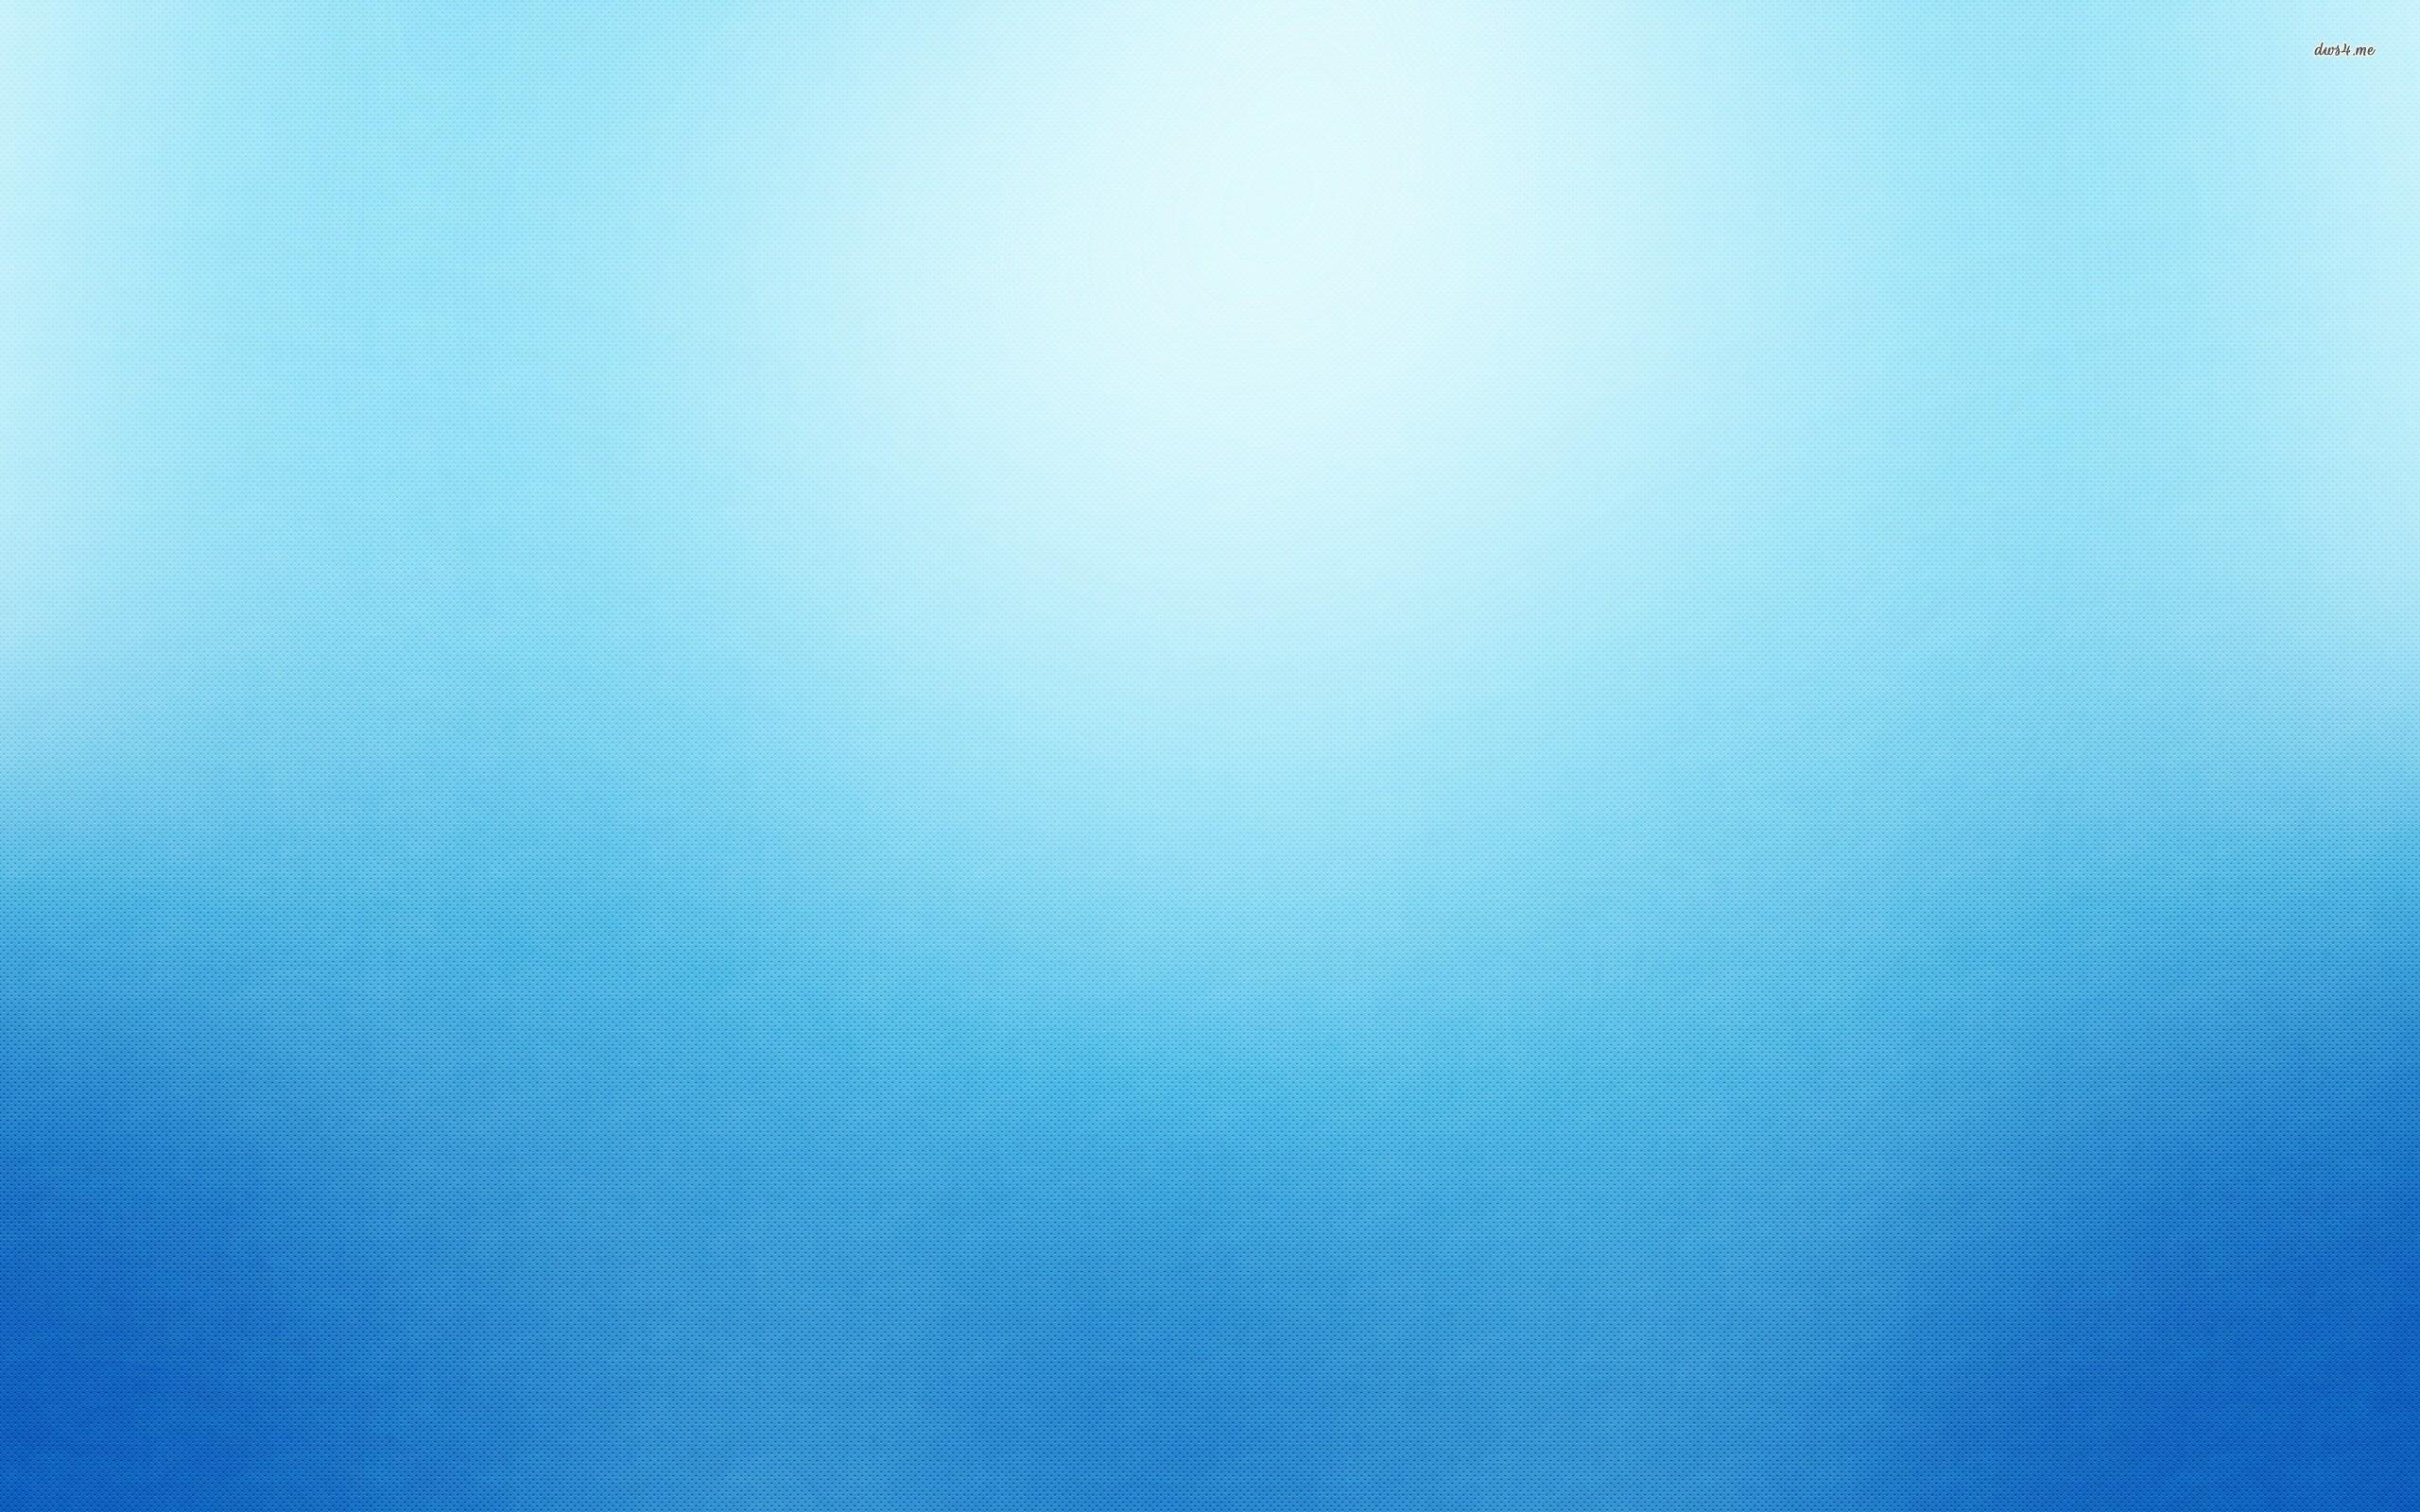 Light Blue Texture Wallpaper 51 Images